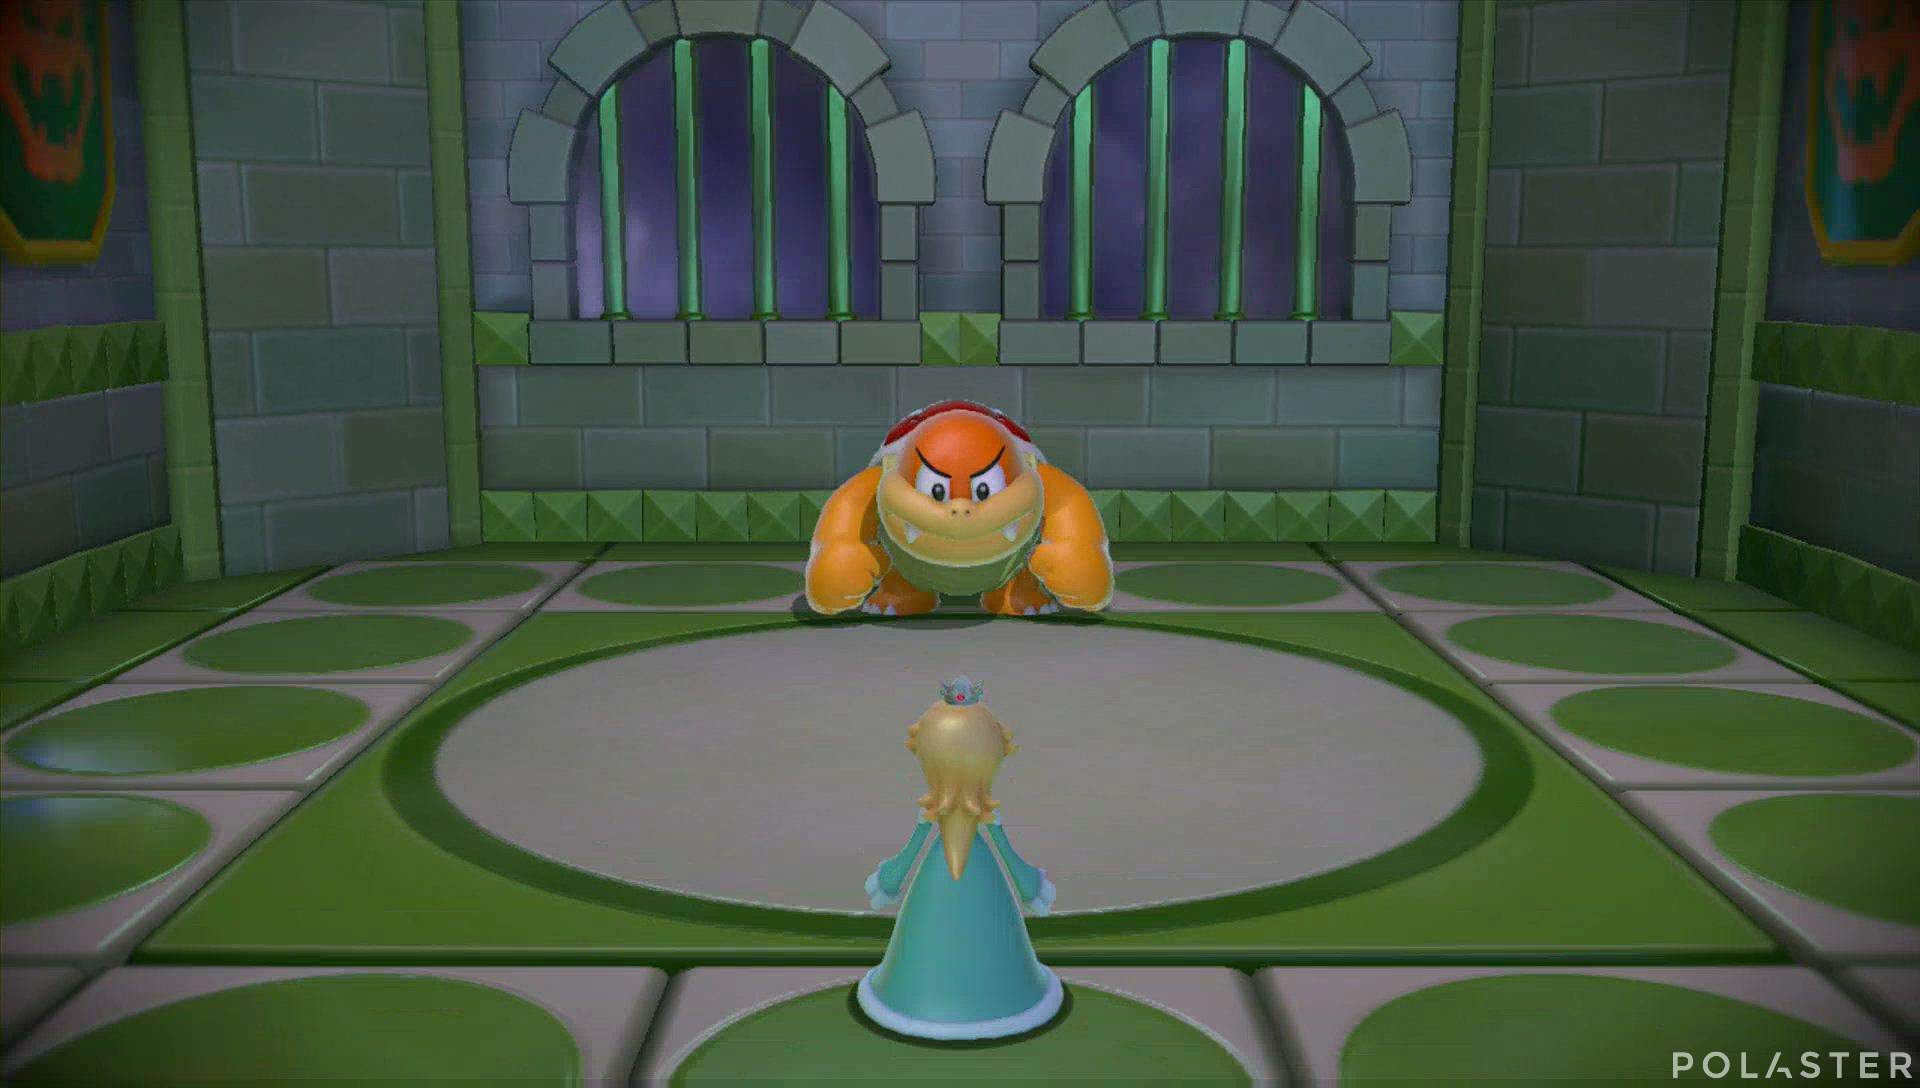 Super Mario 3D World Mundo Flor-12 Jefe Bum Bum